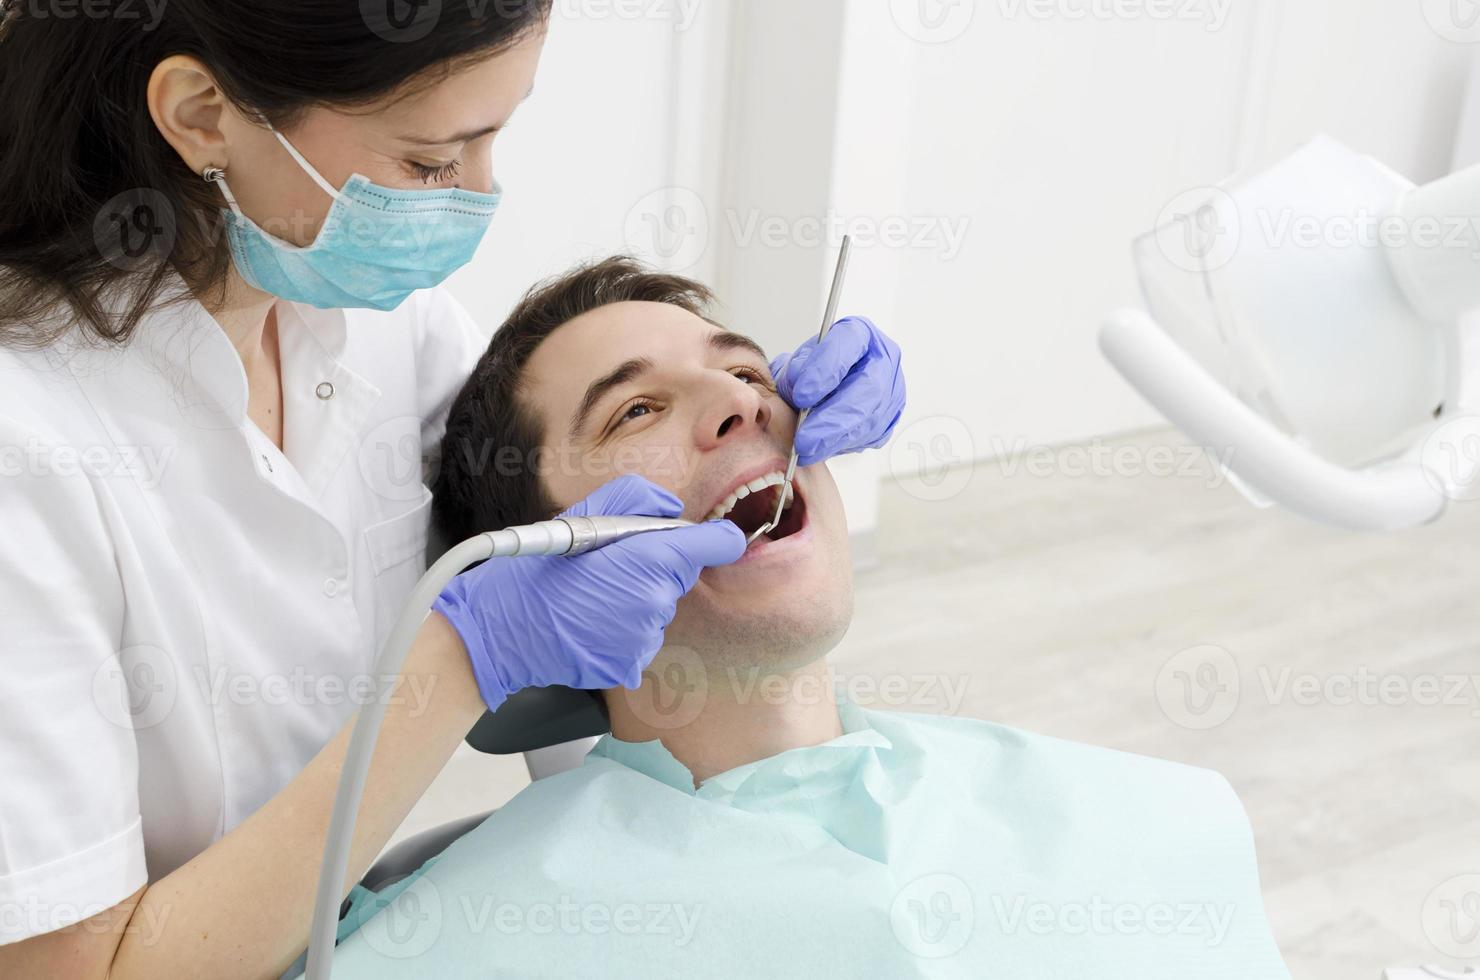 dentaire photo